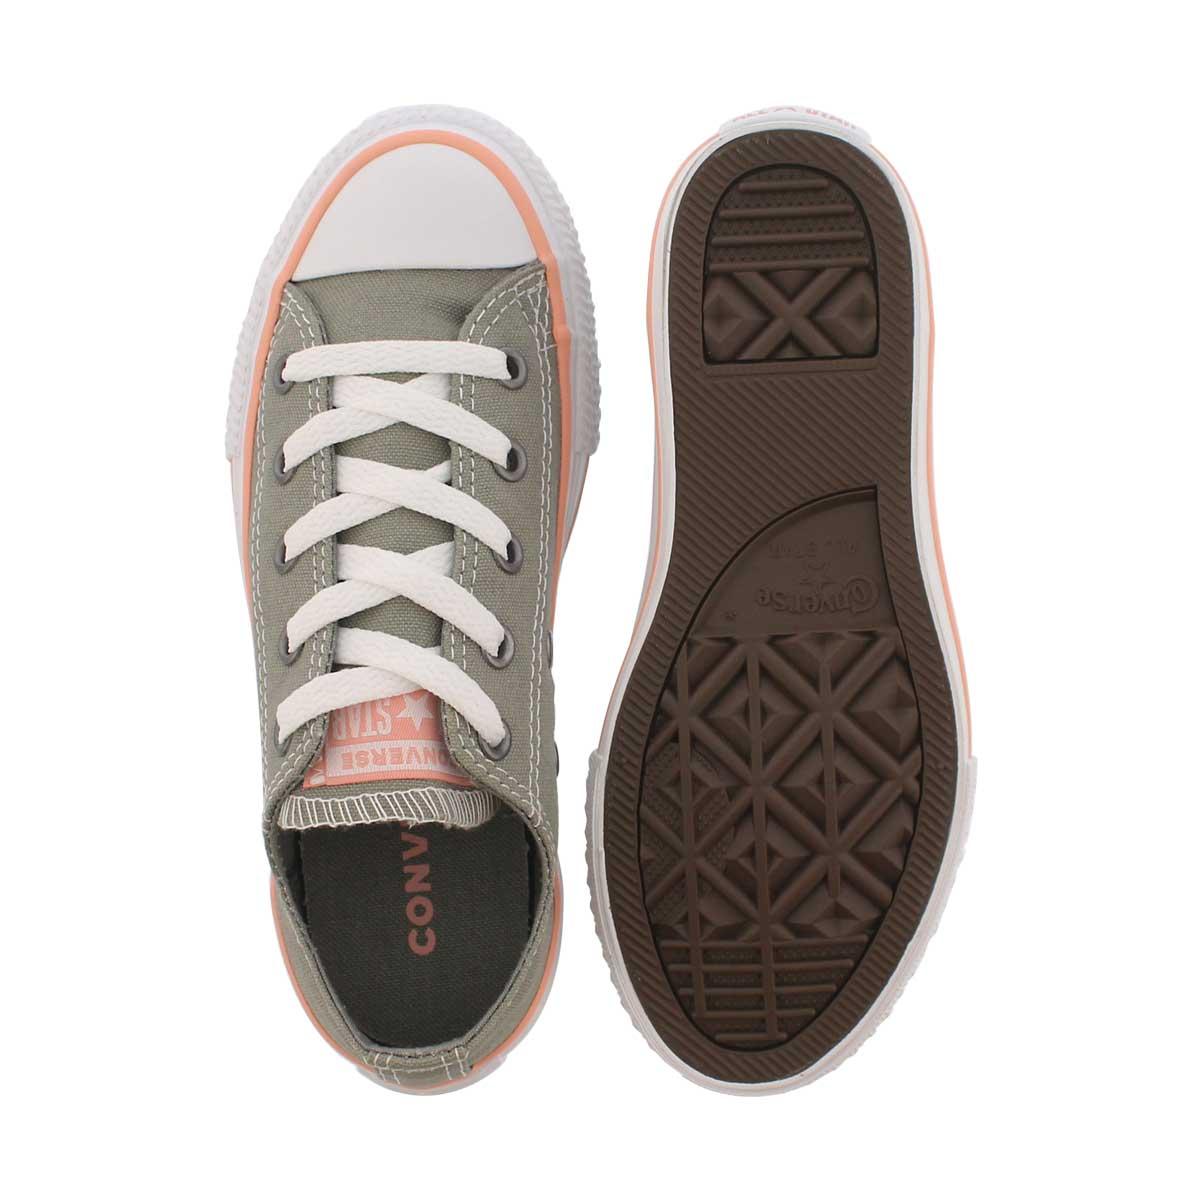 Girls' CT ALL STAR SEASONAL stucco/coral sneakers